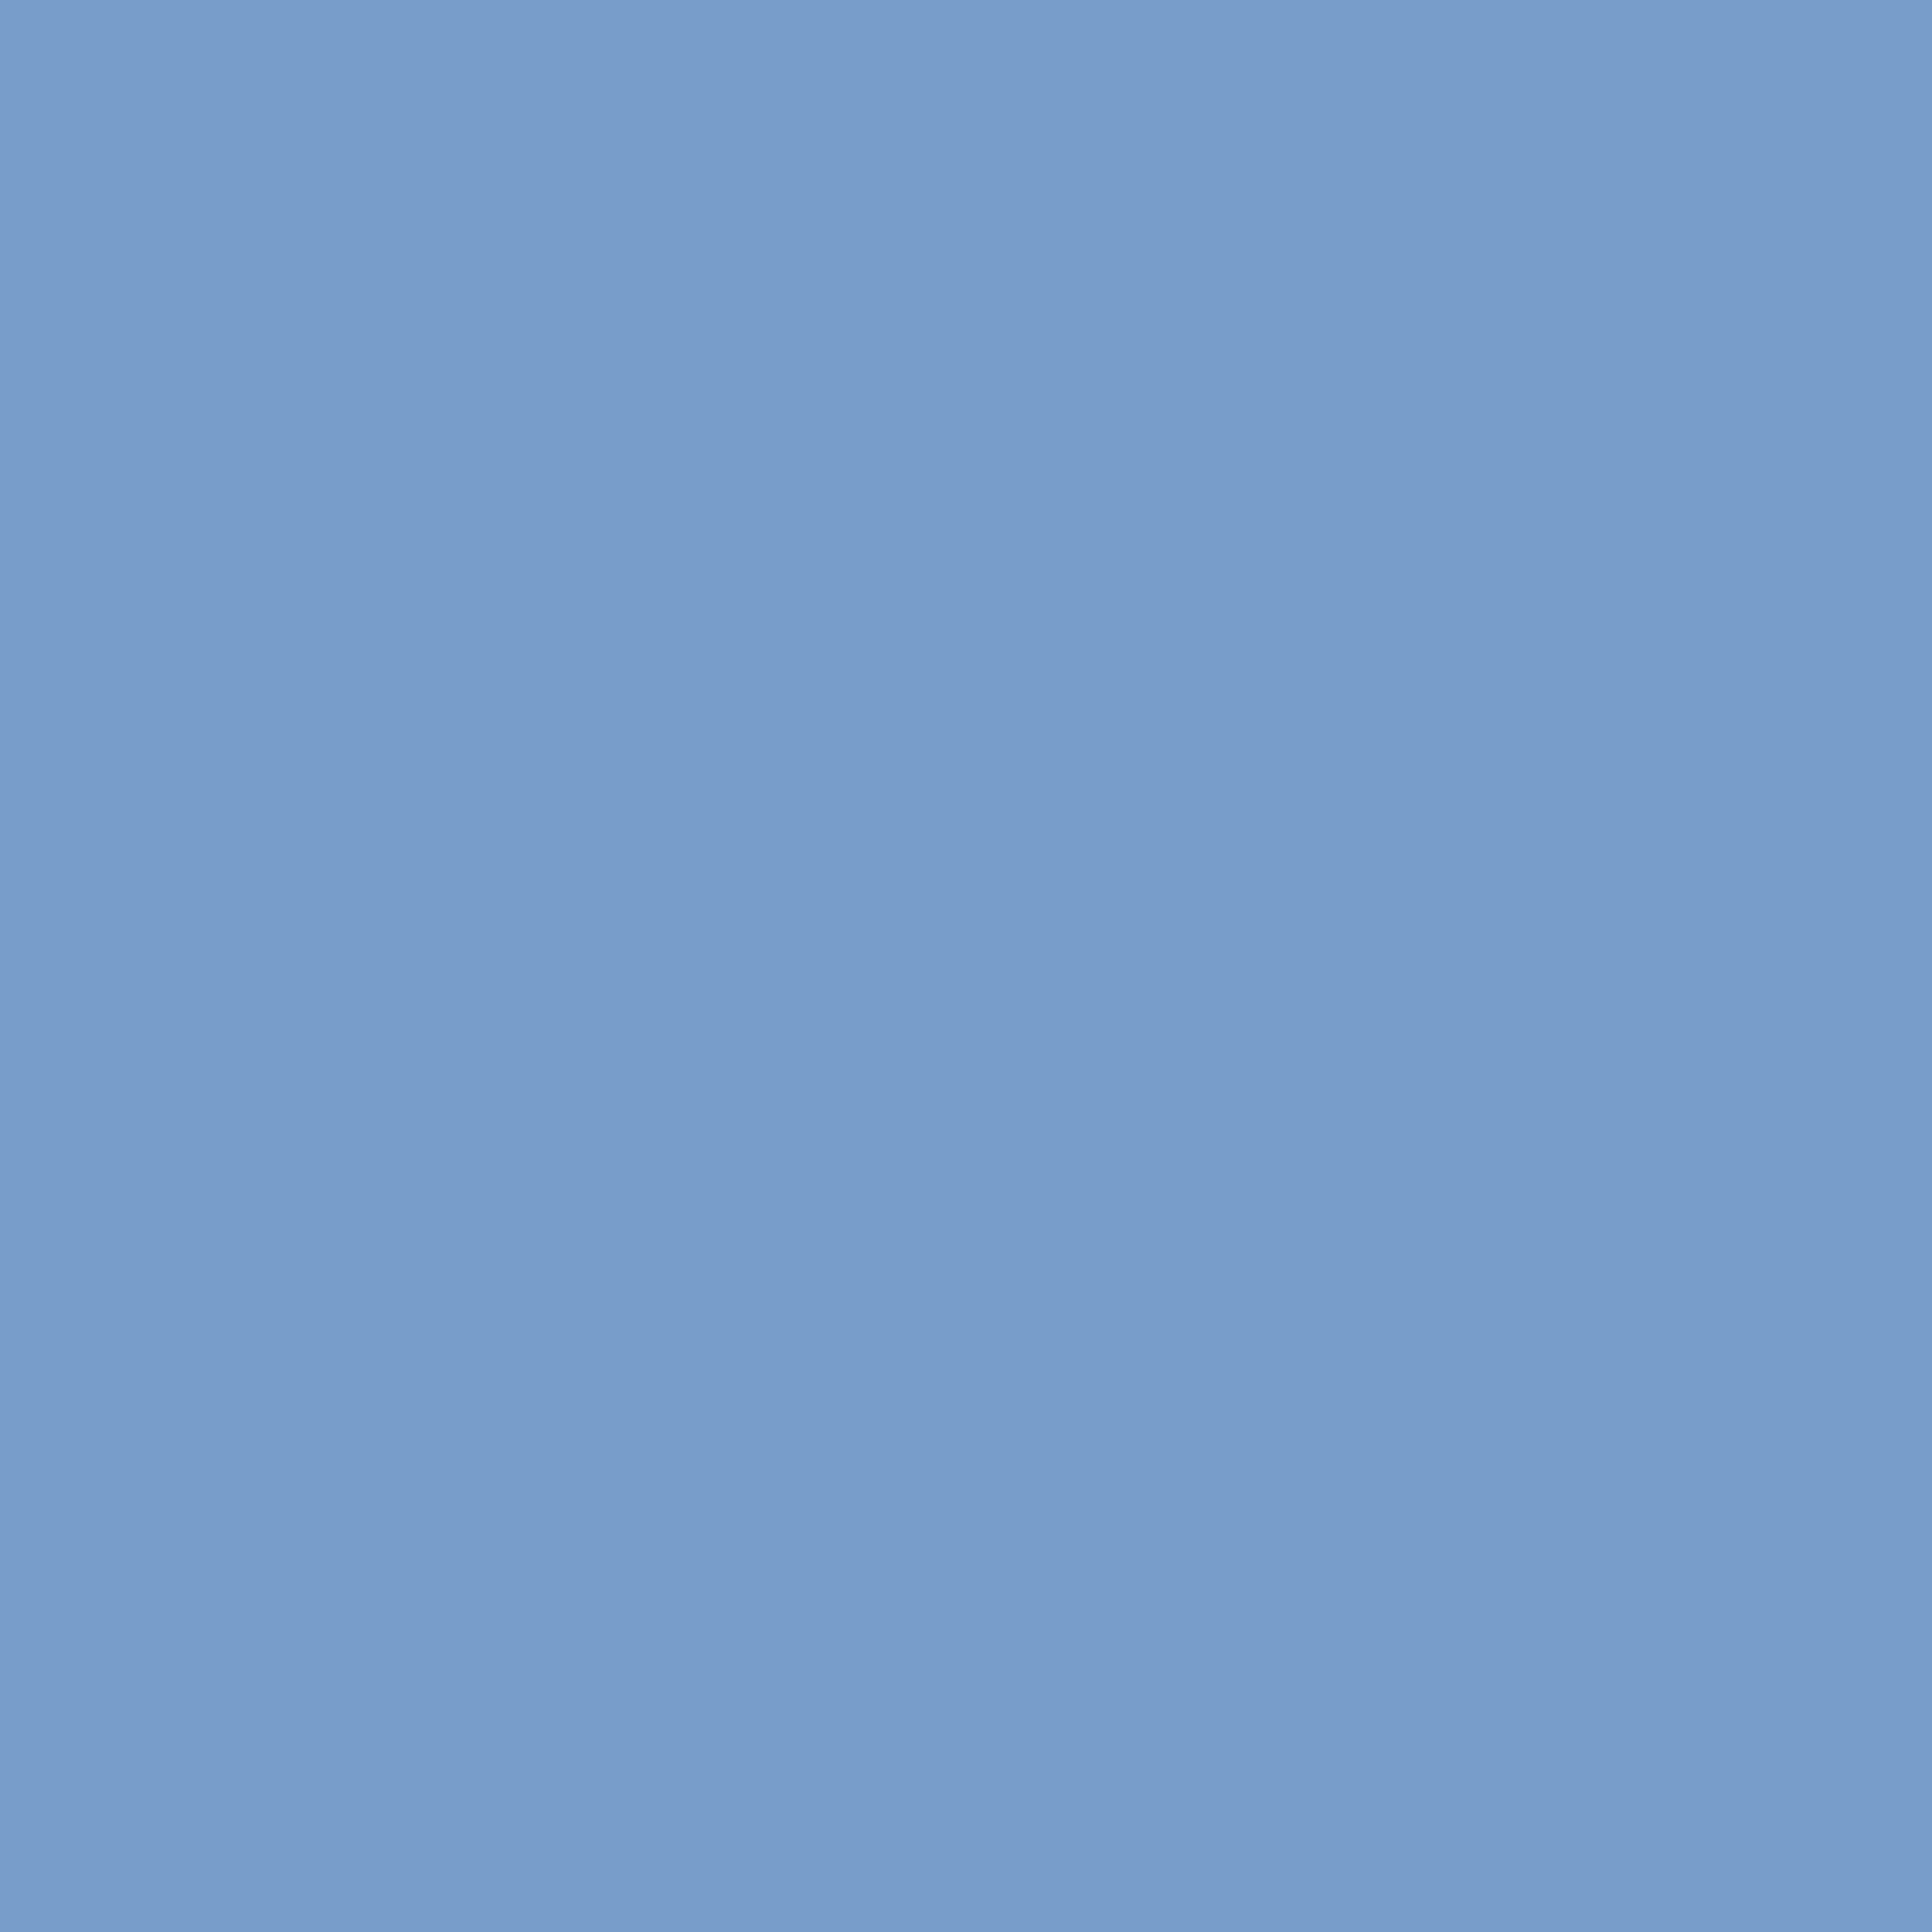 2732x2732 Dark Pastel Blue Solid Color Background